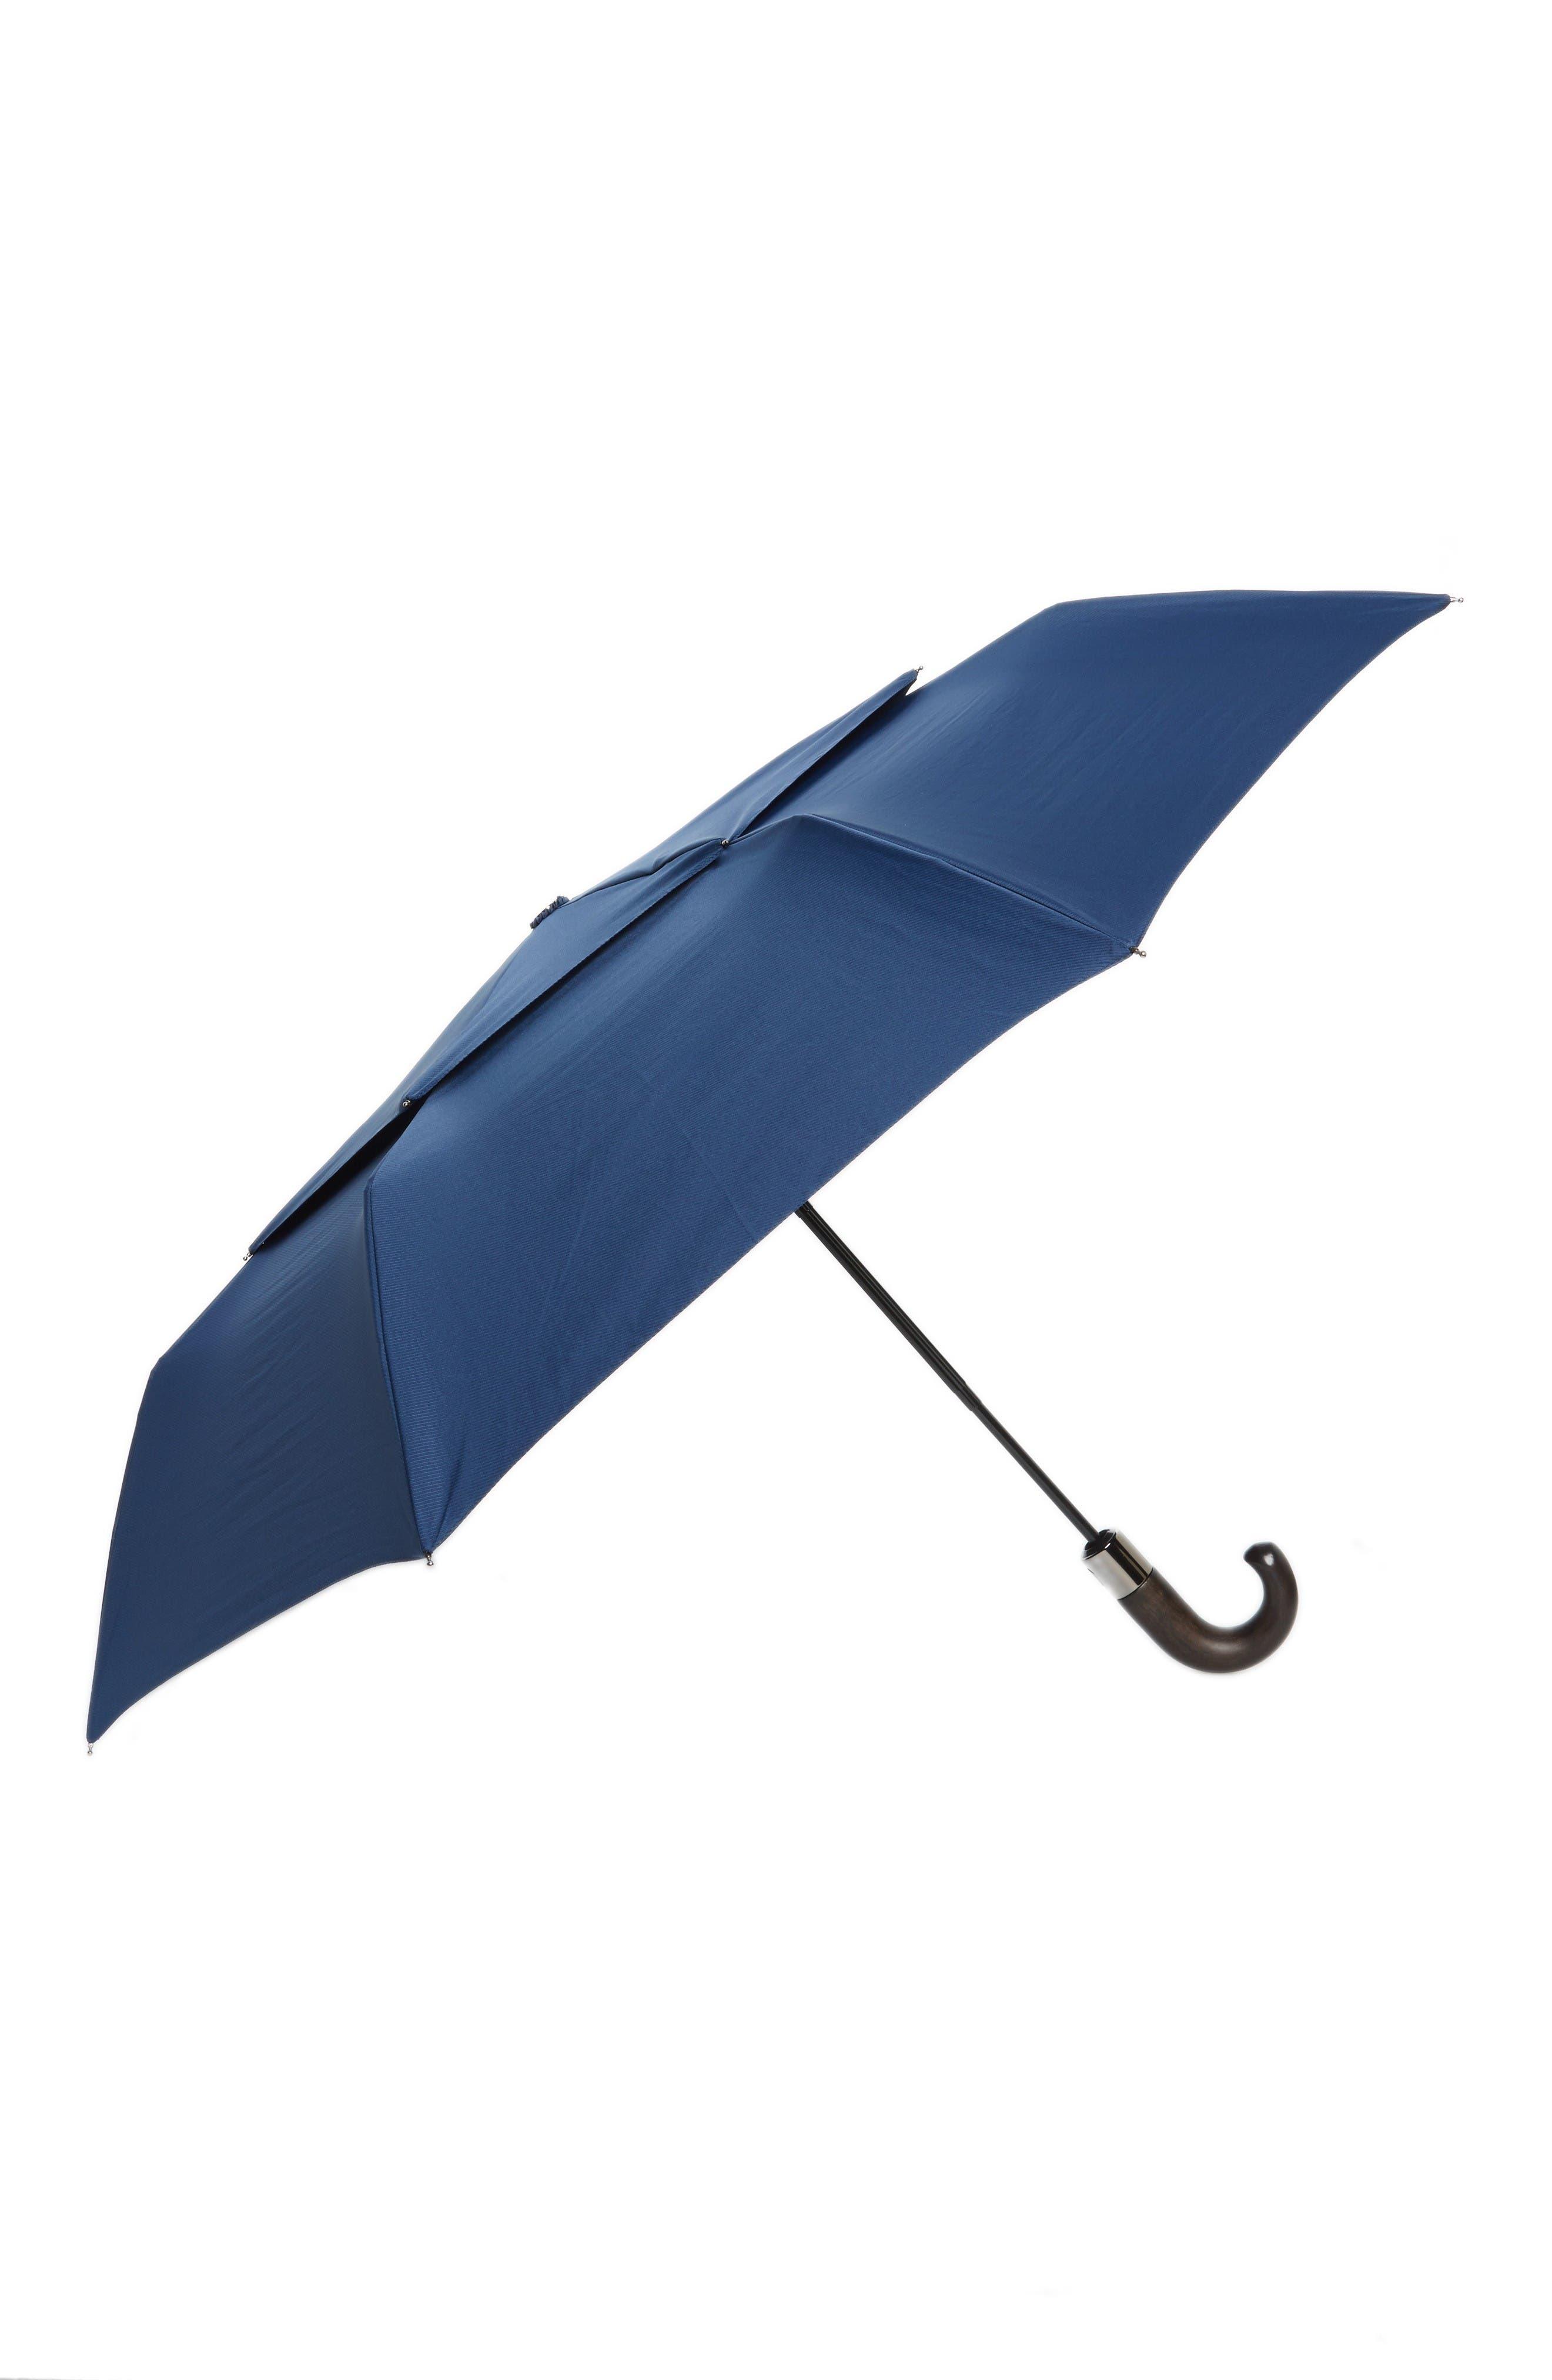 Alternate Image 1 Selected - ShedRain WindPro® Auto Open & Close Umbrella